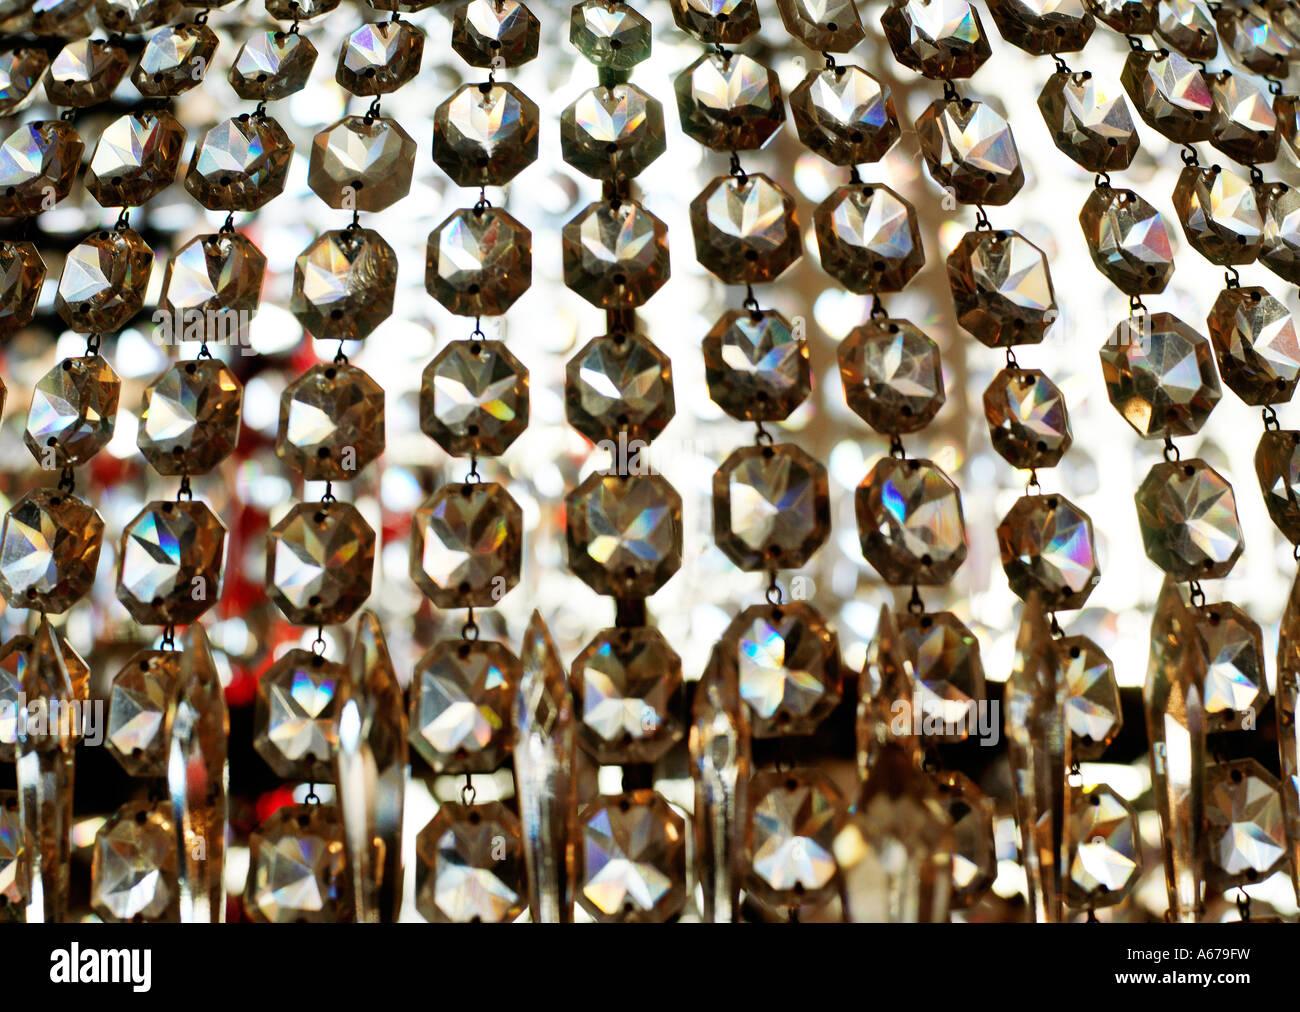 crystal beads - Stock Image